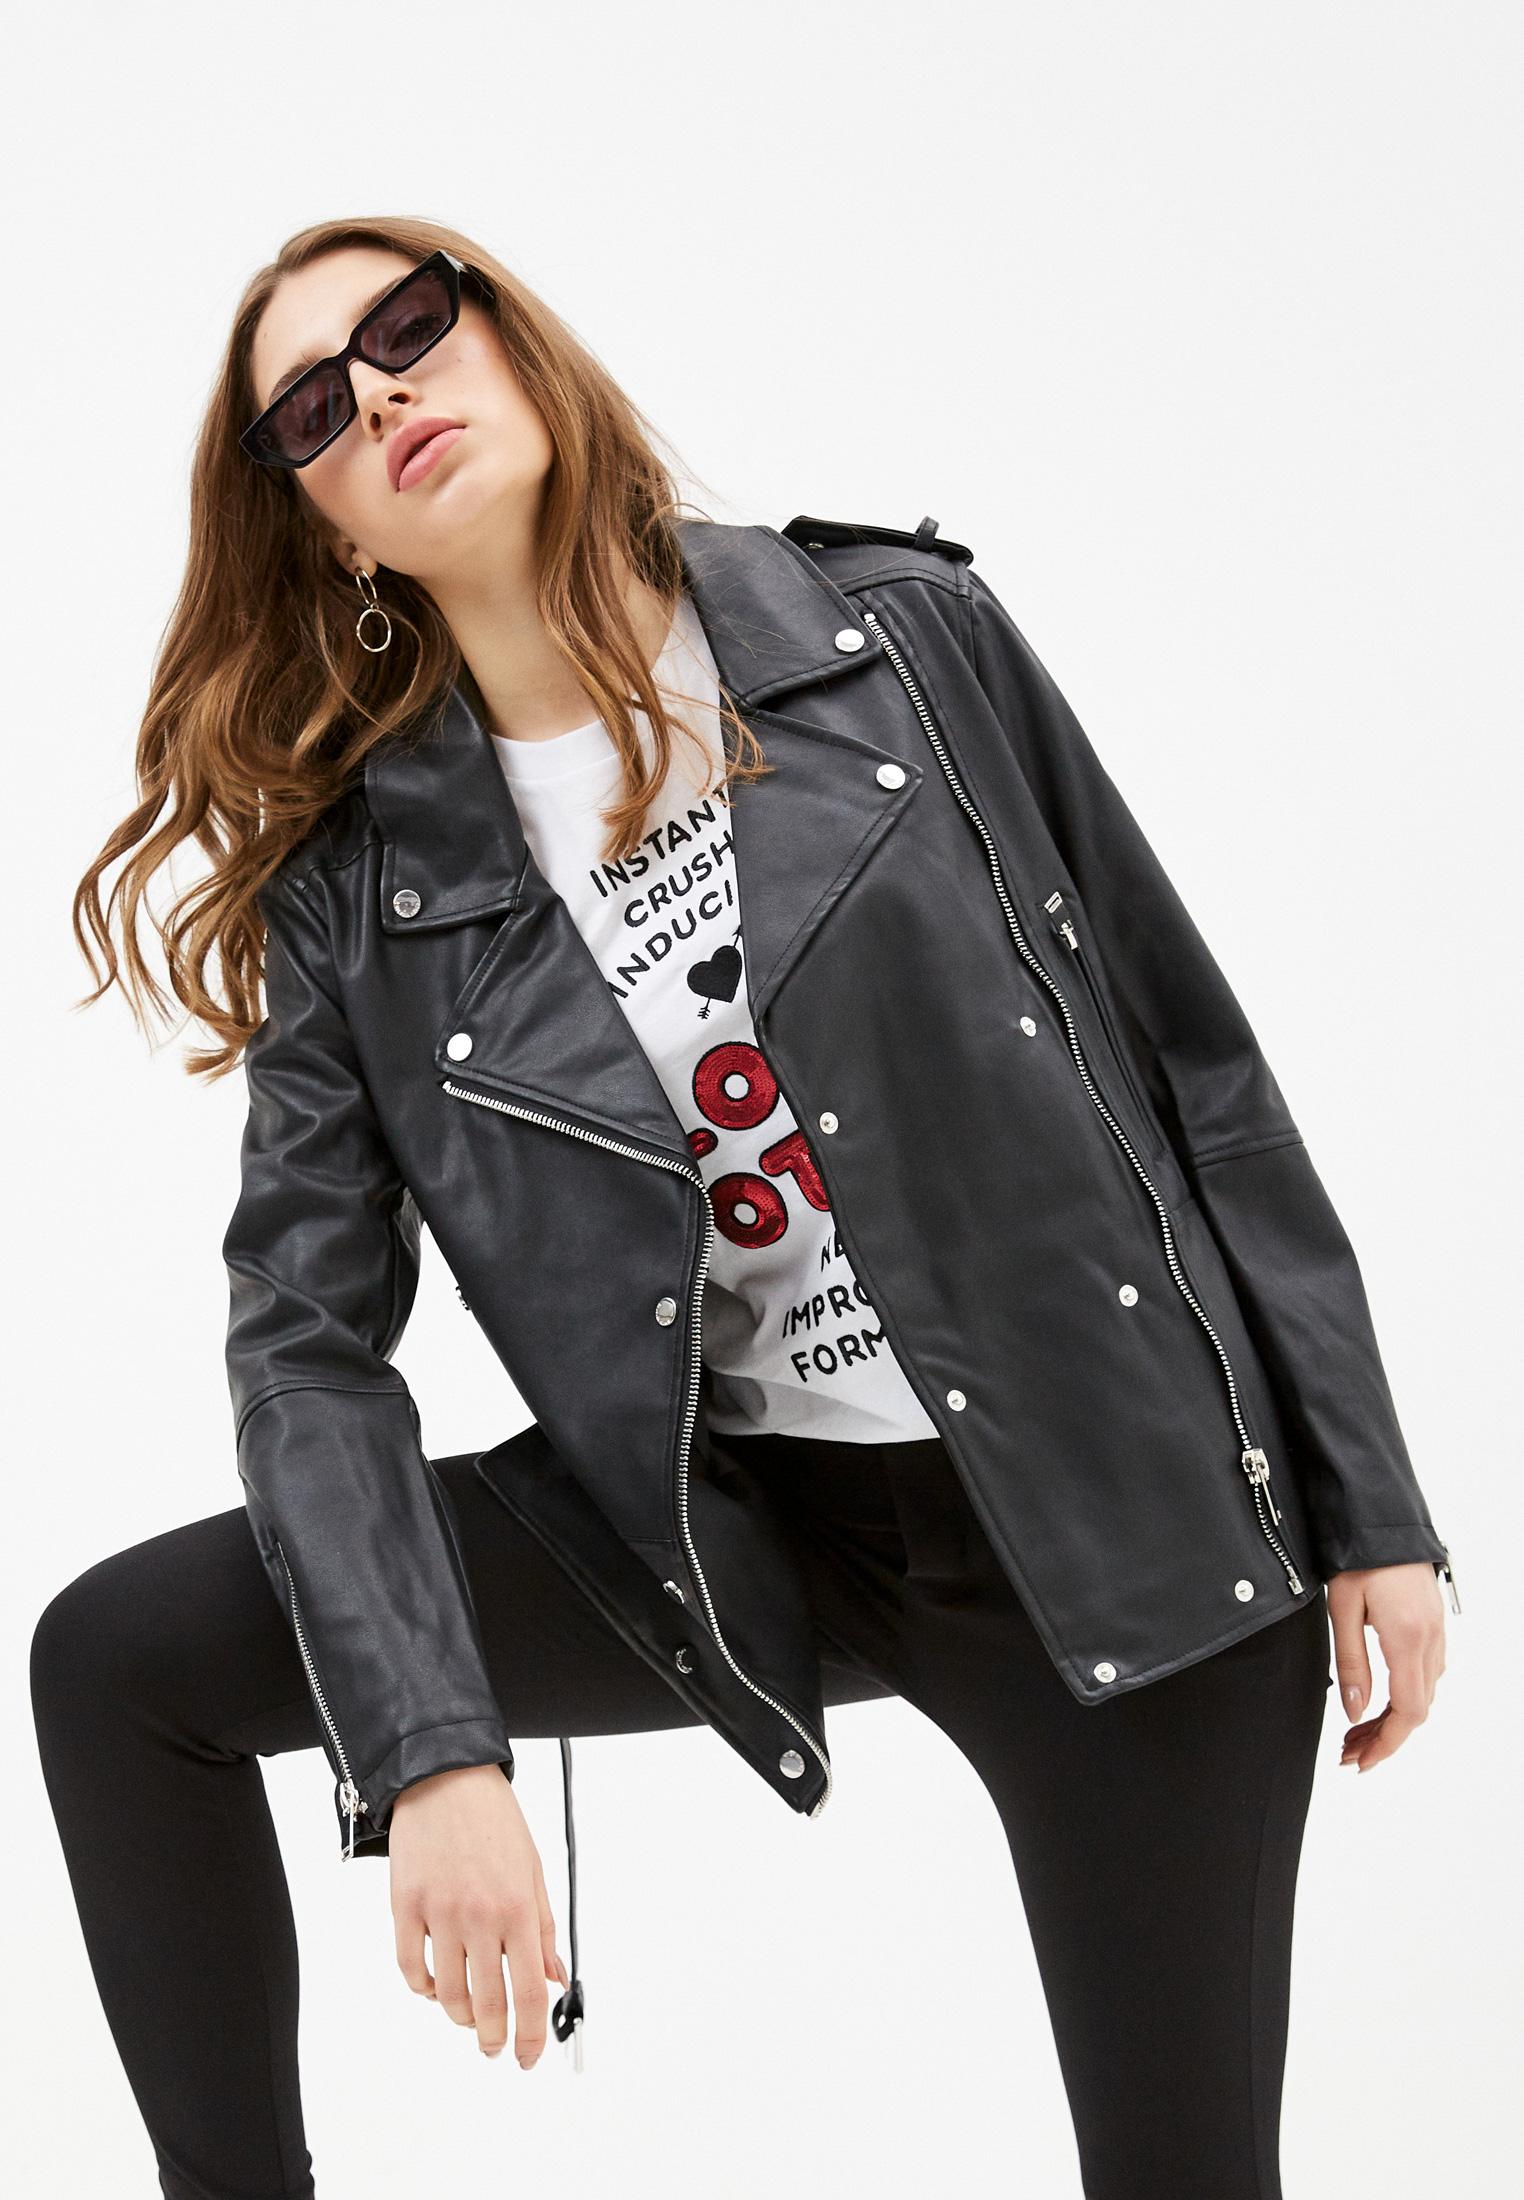 Кожаная куртка Silvian Heach Куртка кожаная Silvian Heach